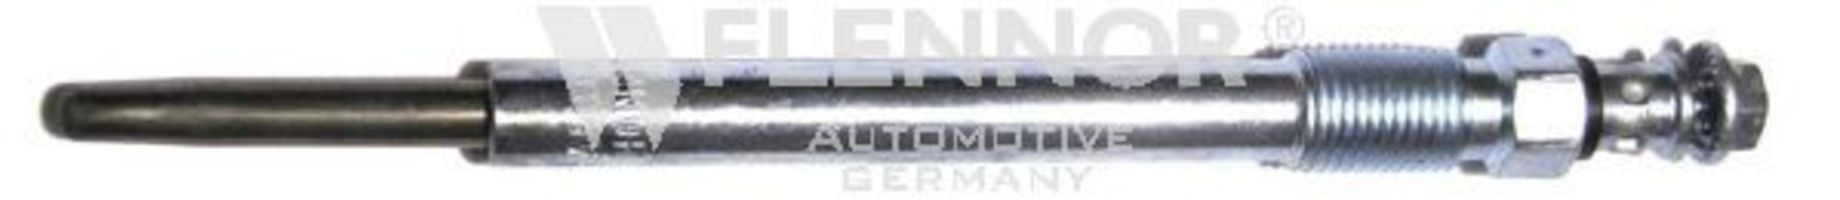 Свеча накаливания FLENNOR FG9193